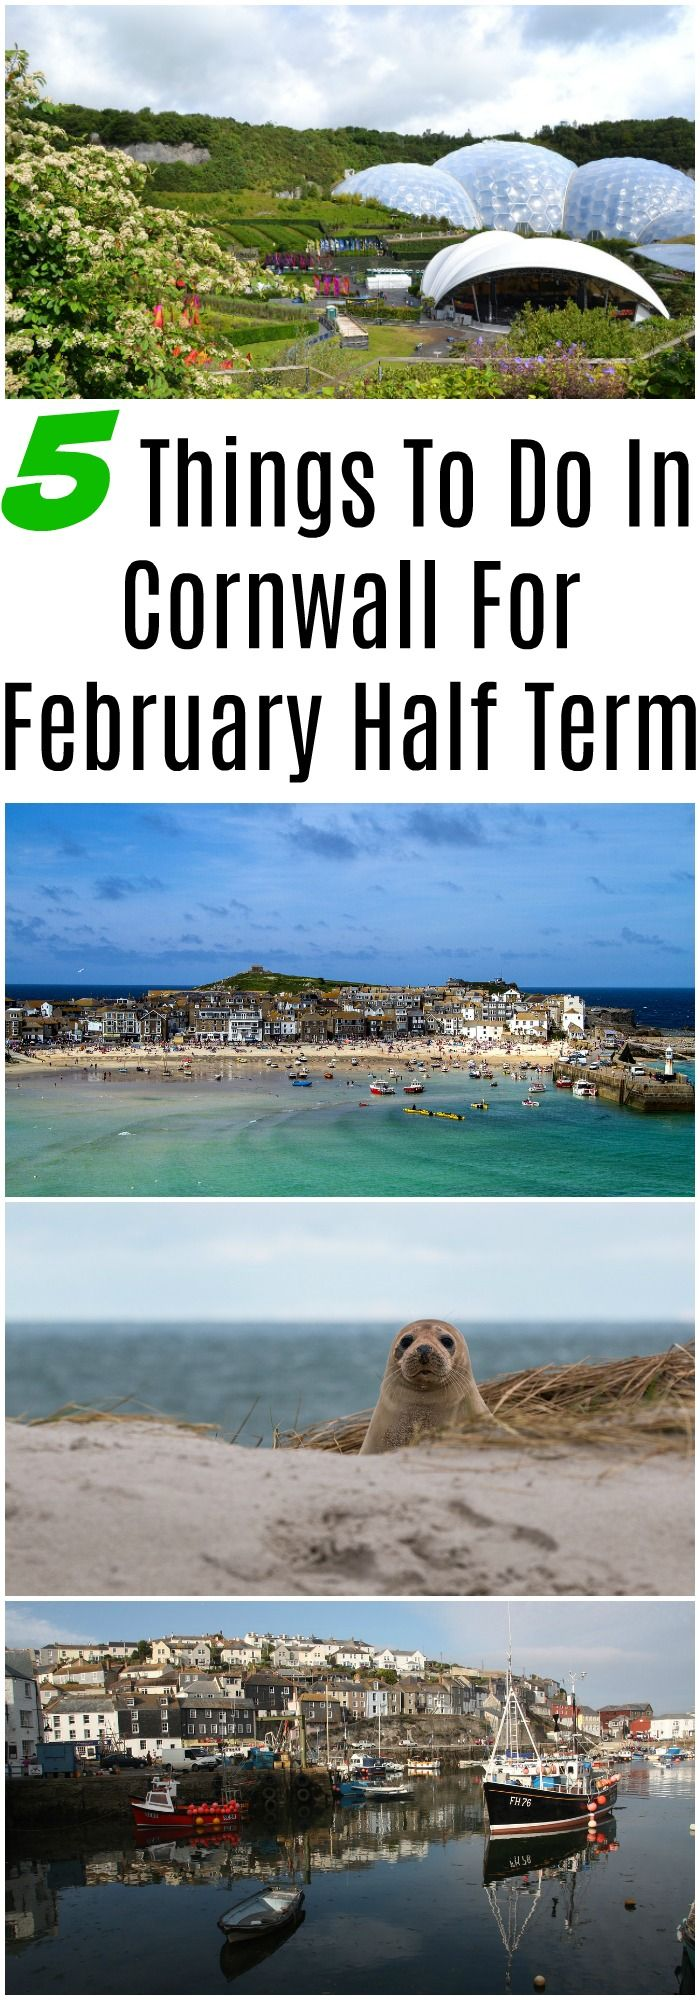 5 Things To Do In Cornwall for Feb February half term #uktravel #cornwall #familytravel #holiday #england #uk